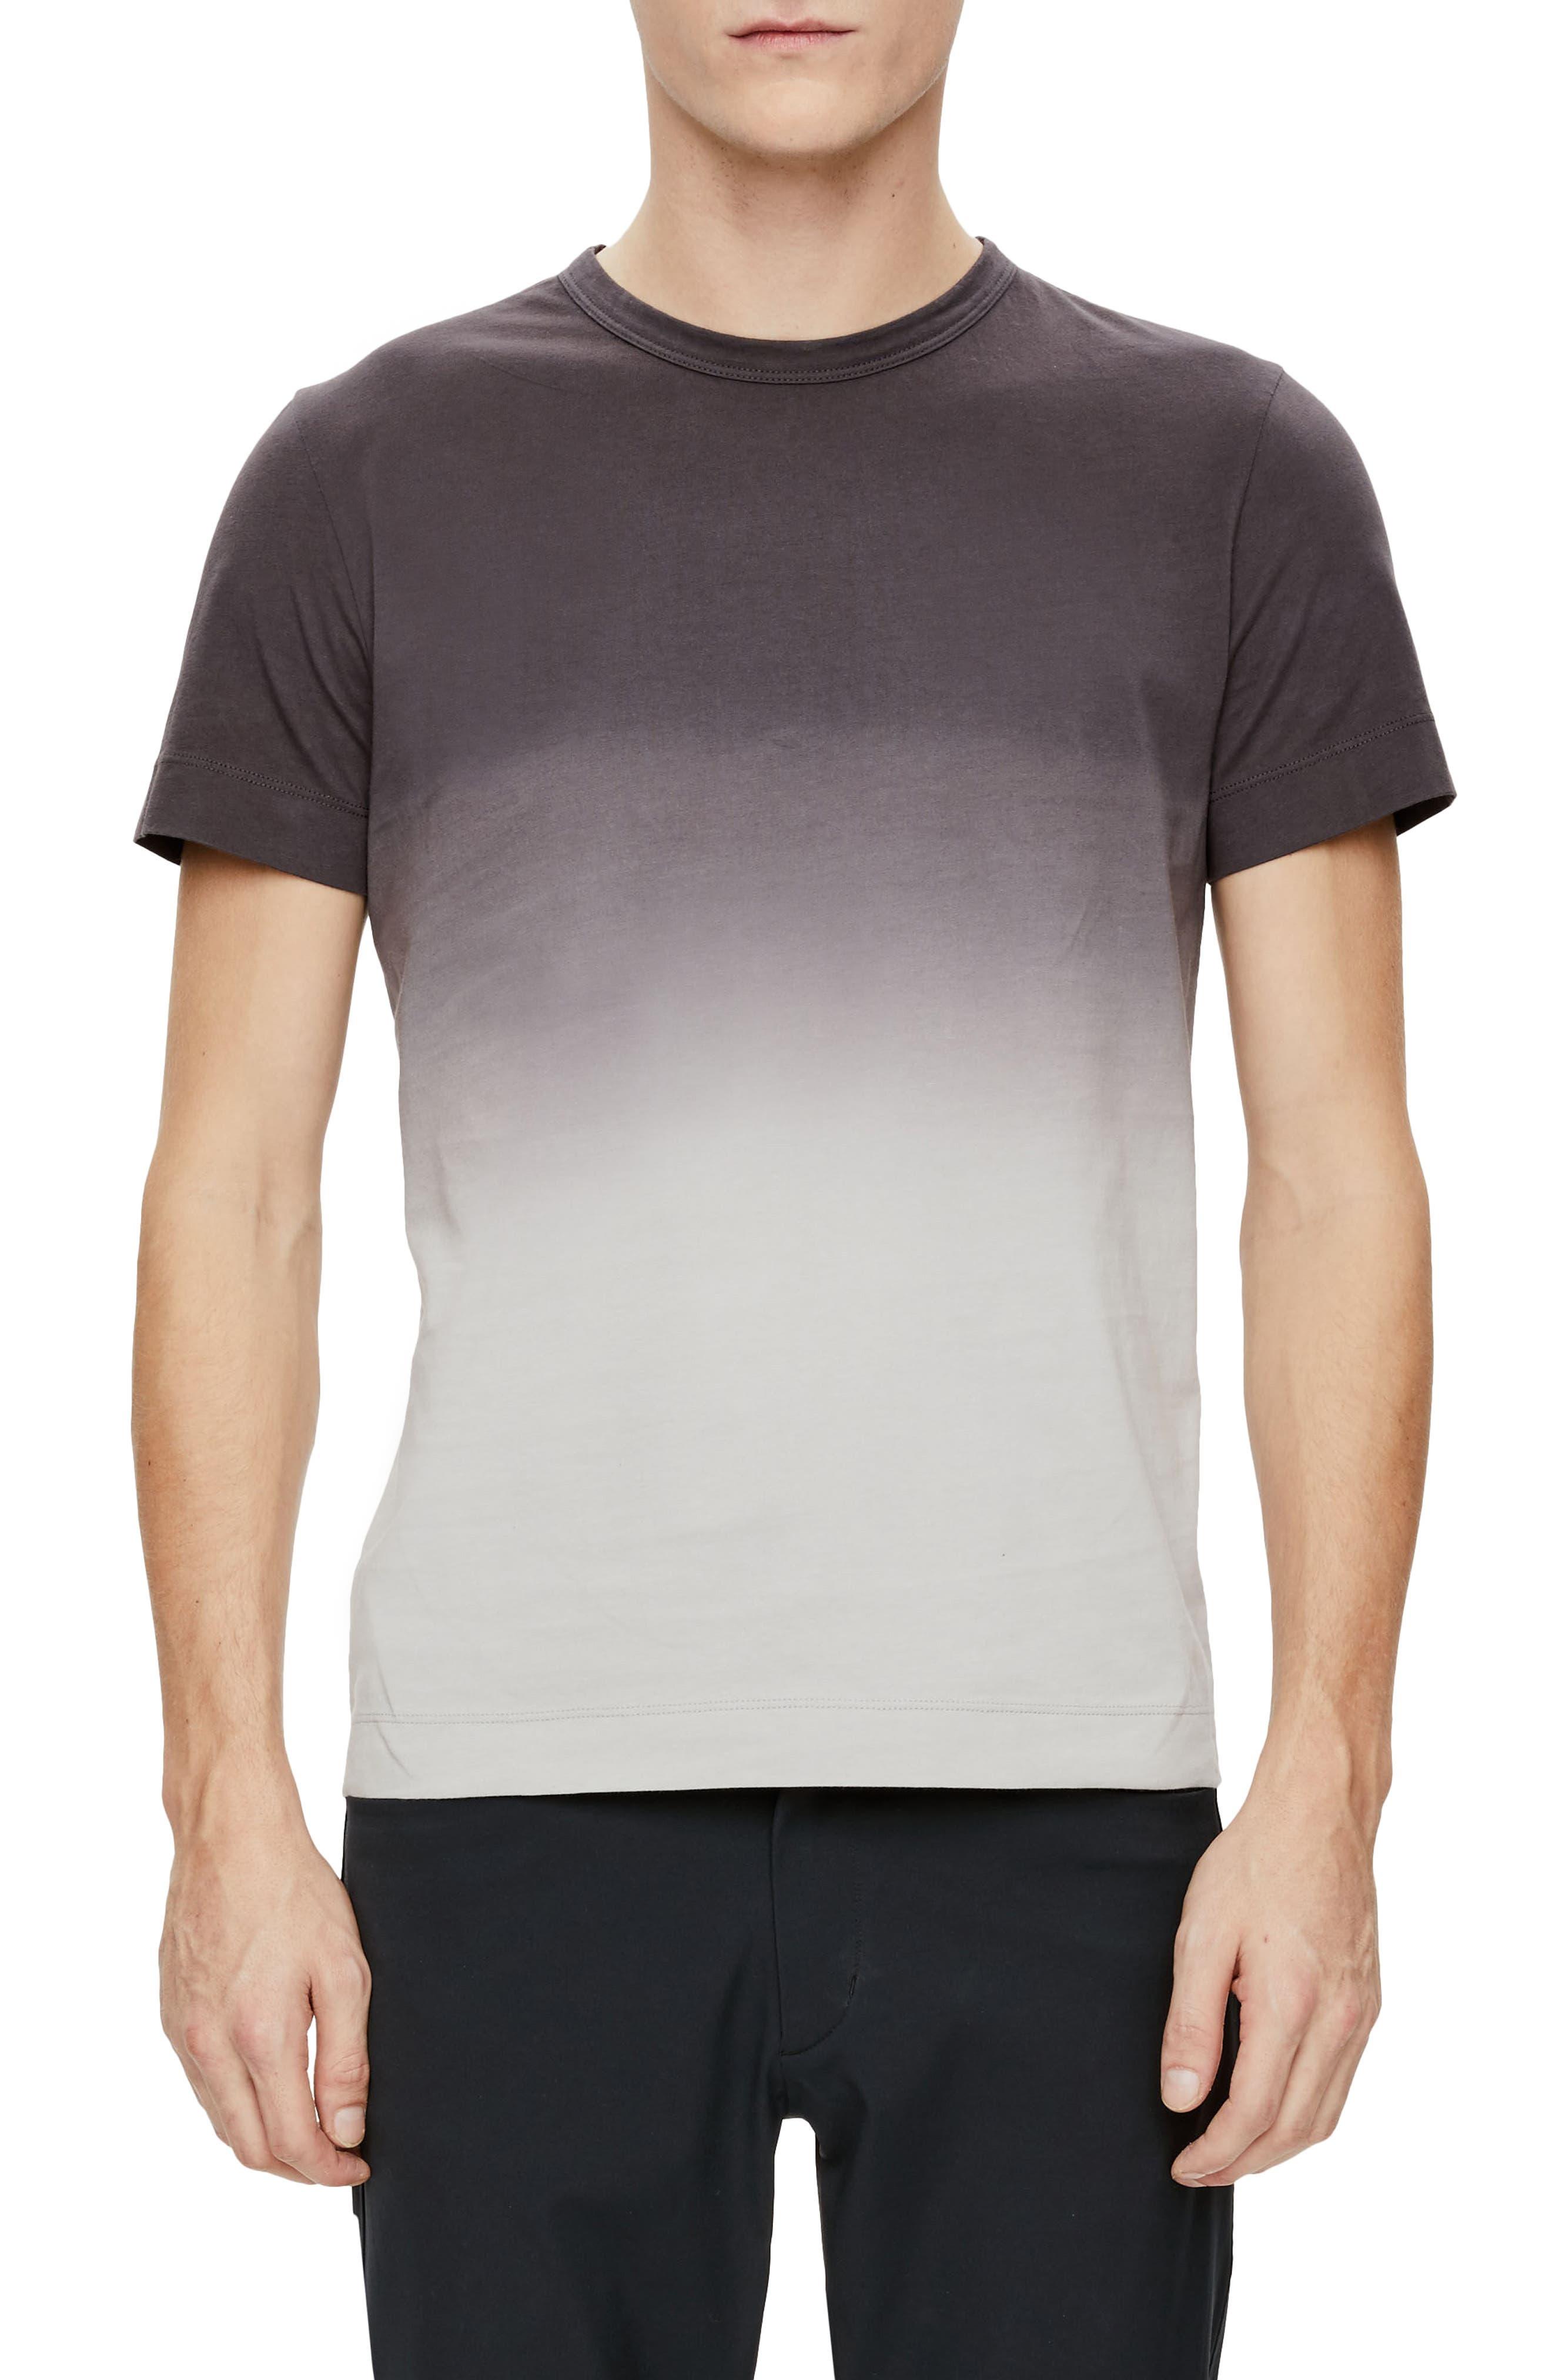 Gaskell Dip Dye Ombré T-Shirt,                         Main,                         color, 082